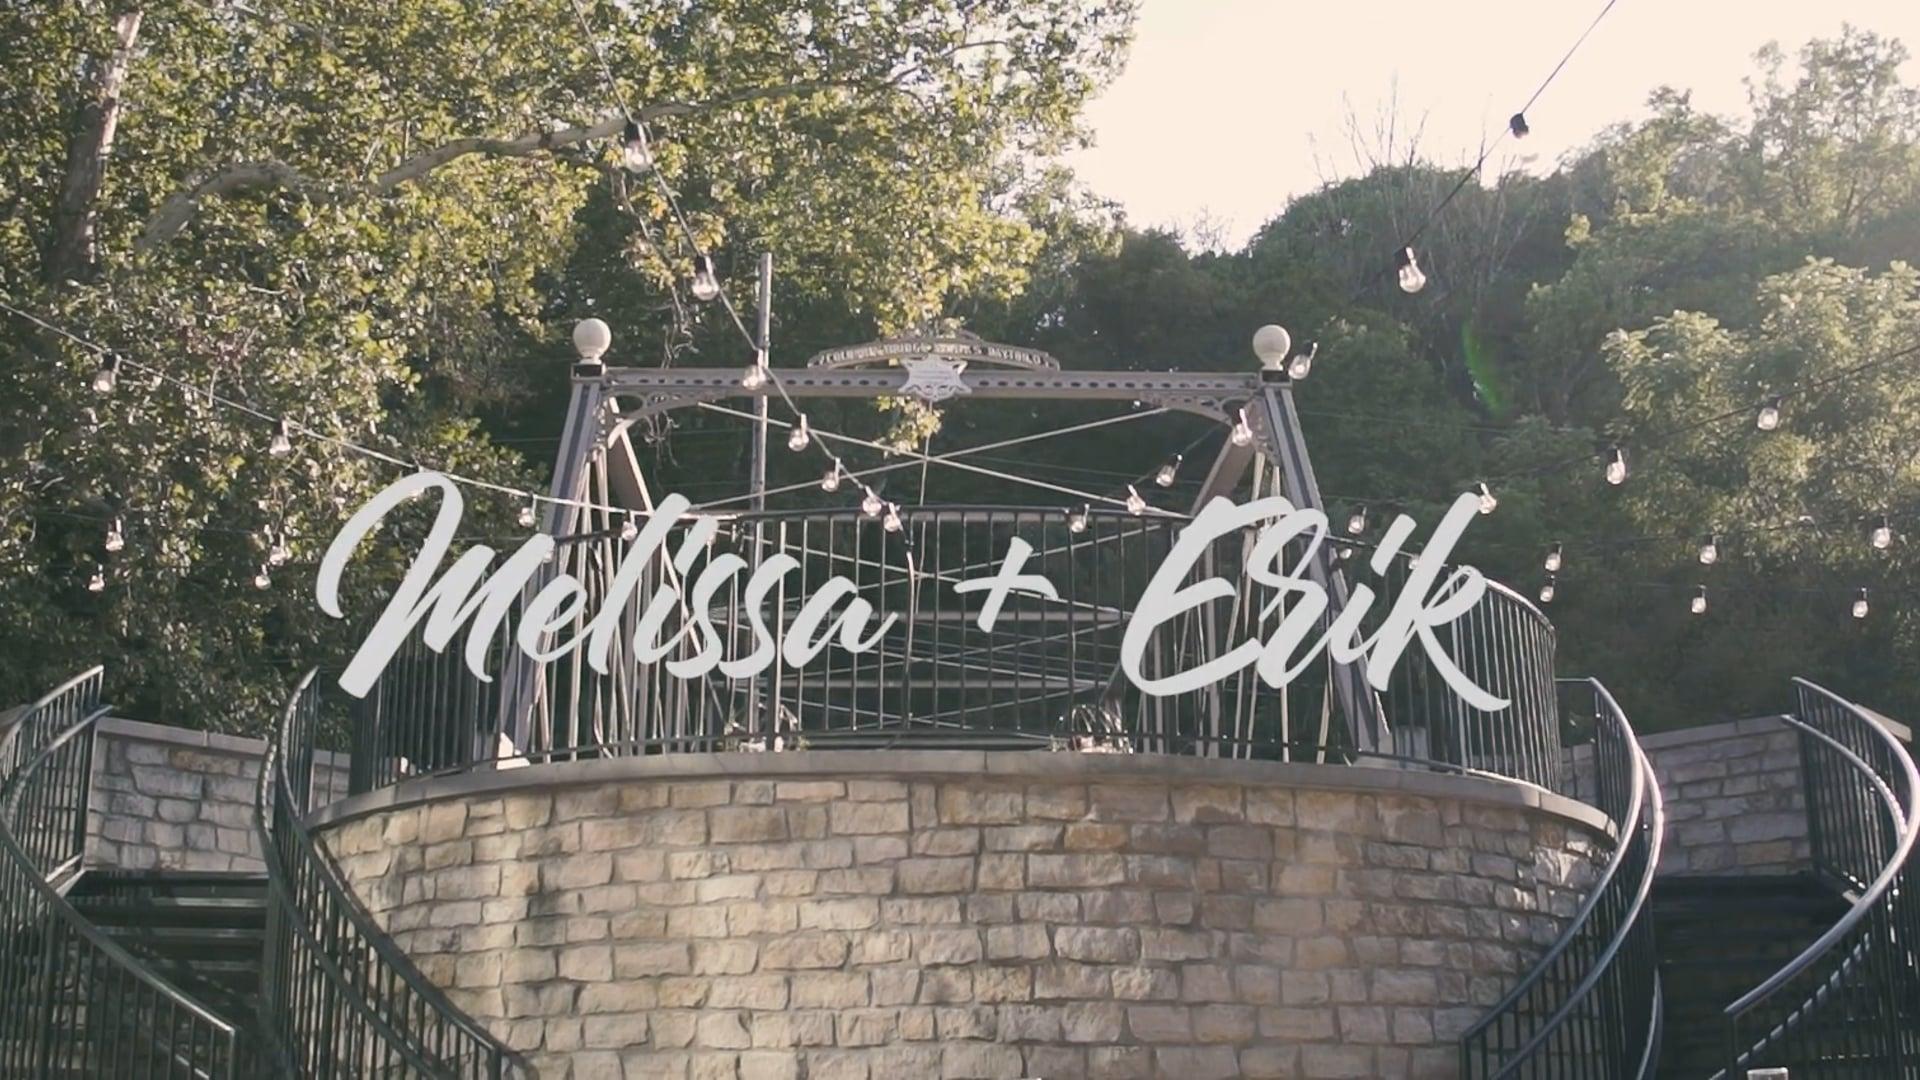 Melissa + Erik - Wedding Feature